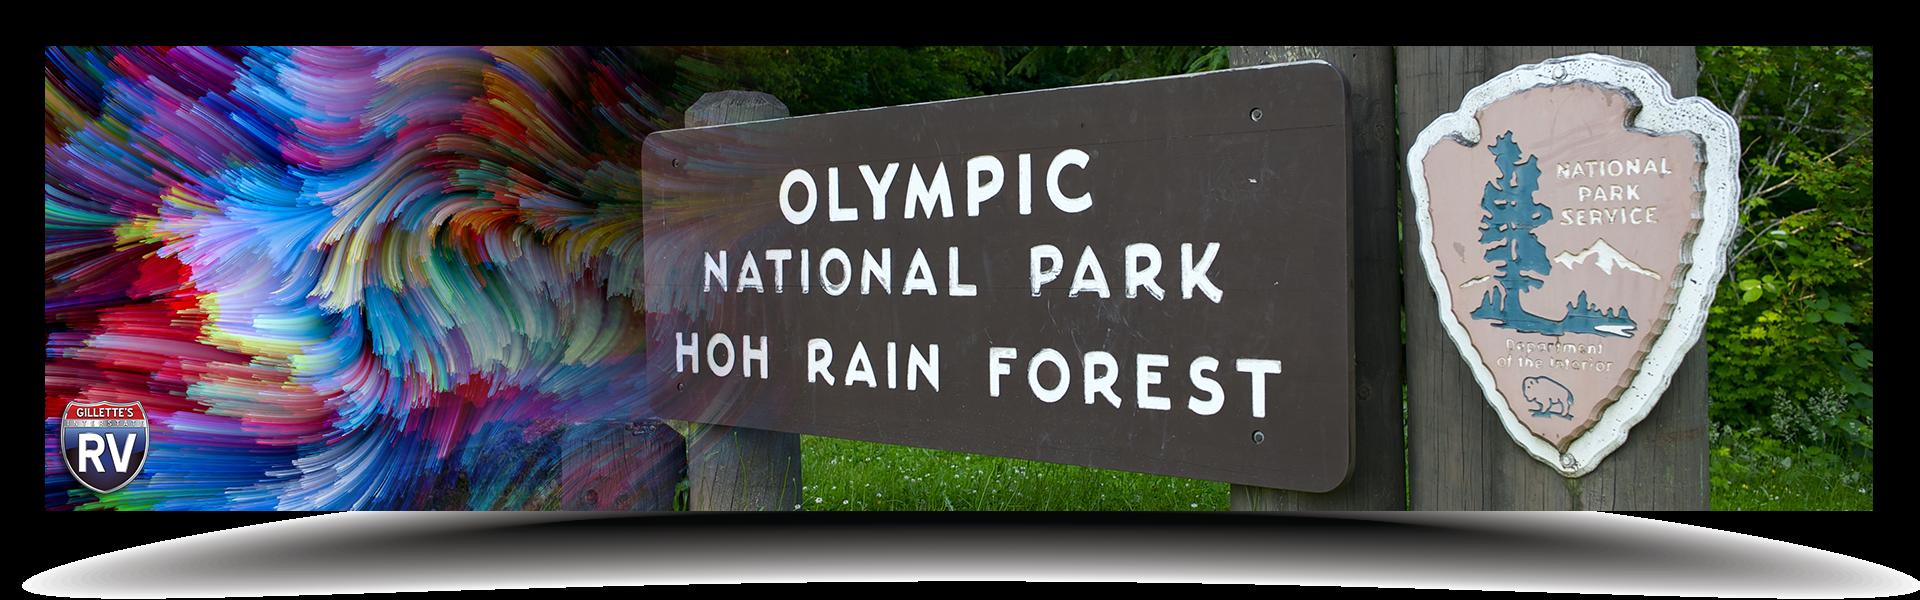 Exploring Olympic National Park, WA